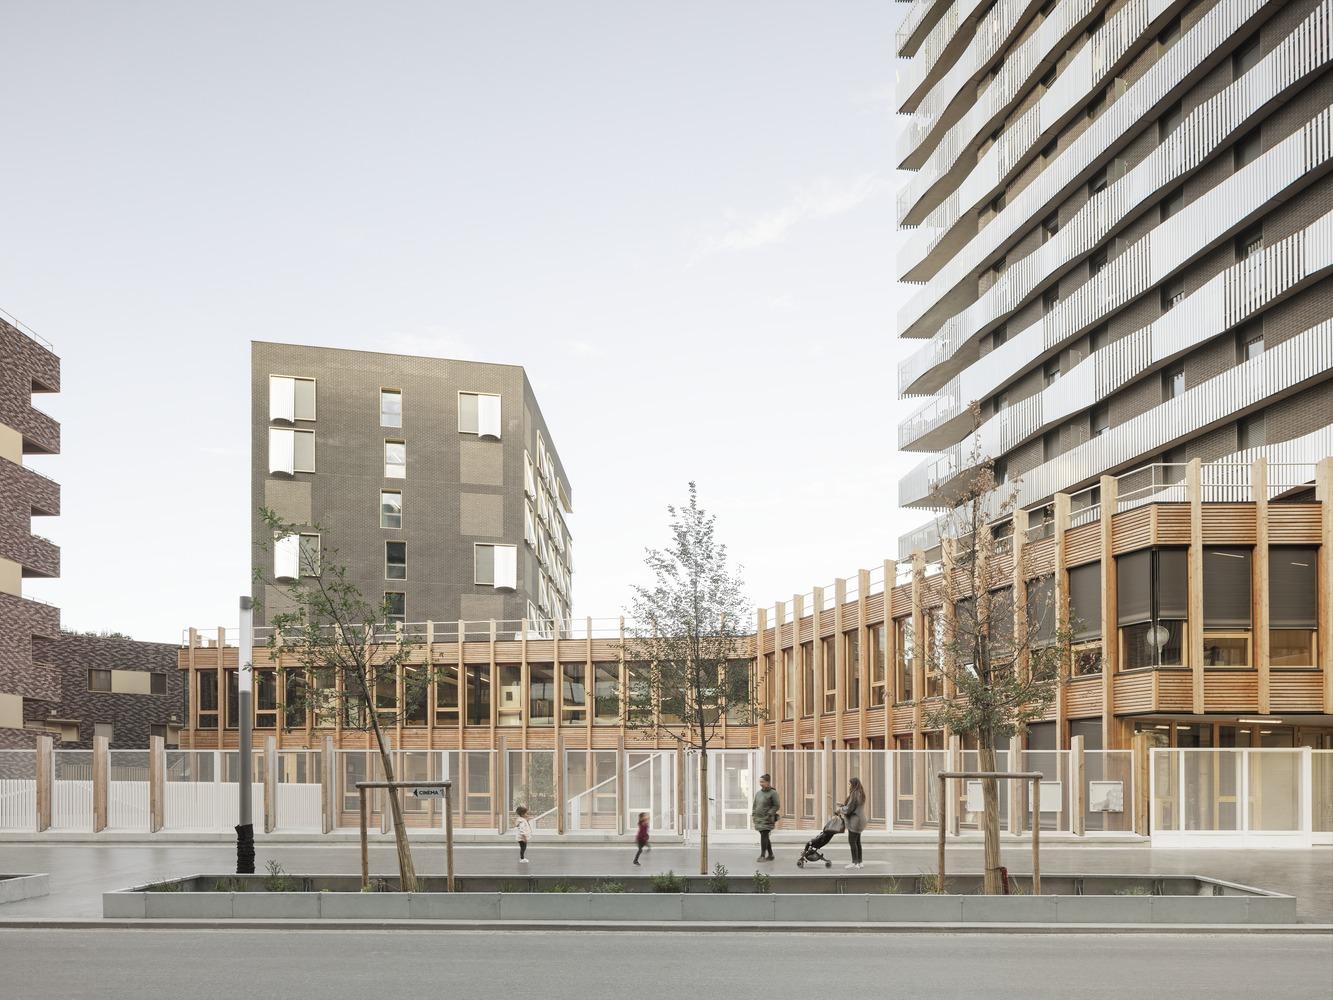 O6A LOT Housing / SAM architecture + Querkraft